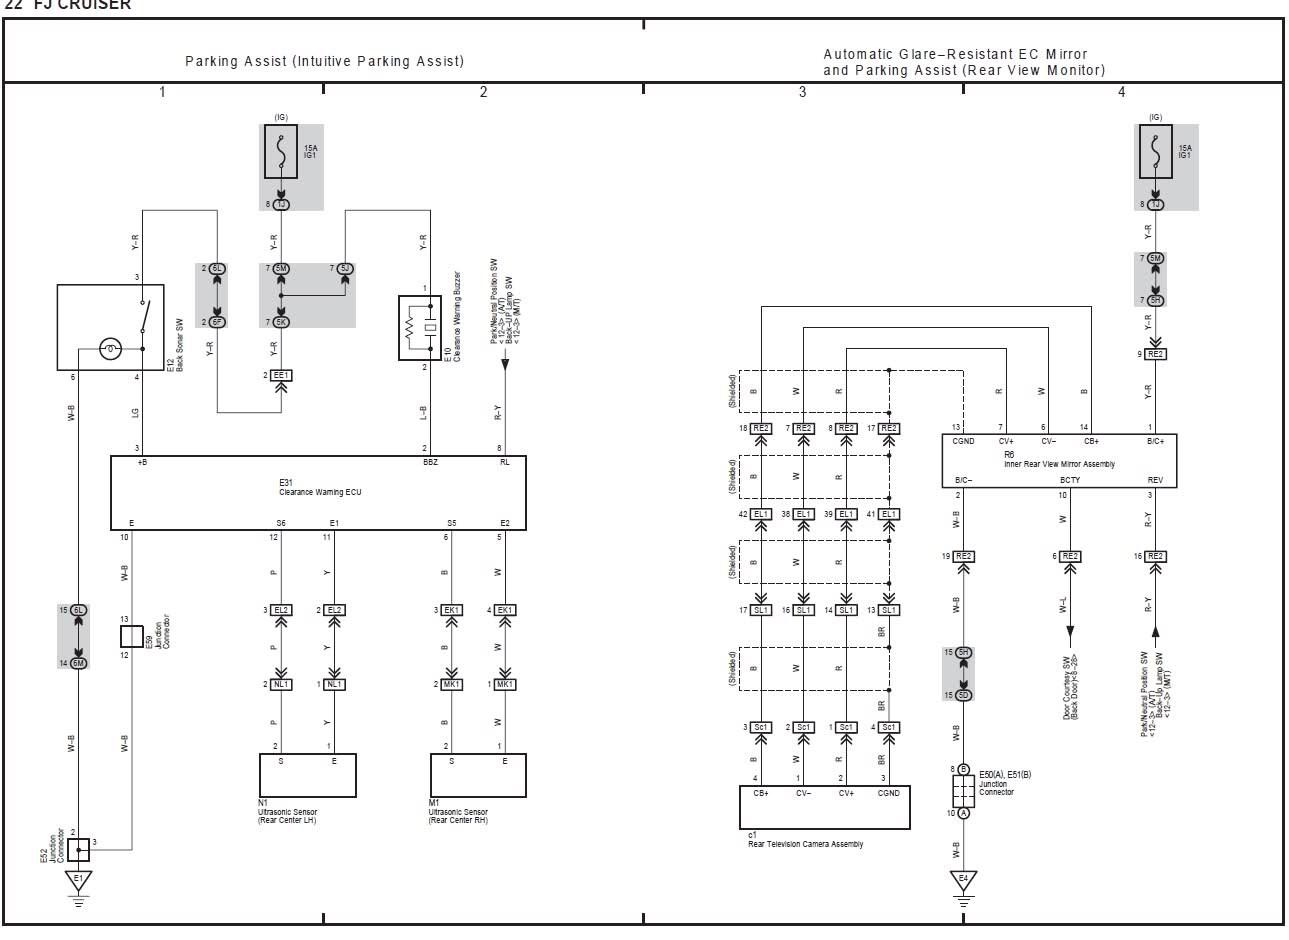 Land Cruiser Stereo Wiring Diagram